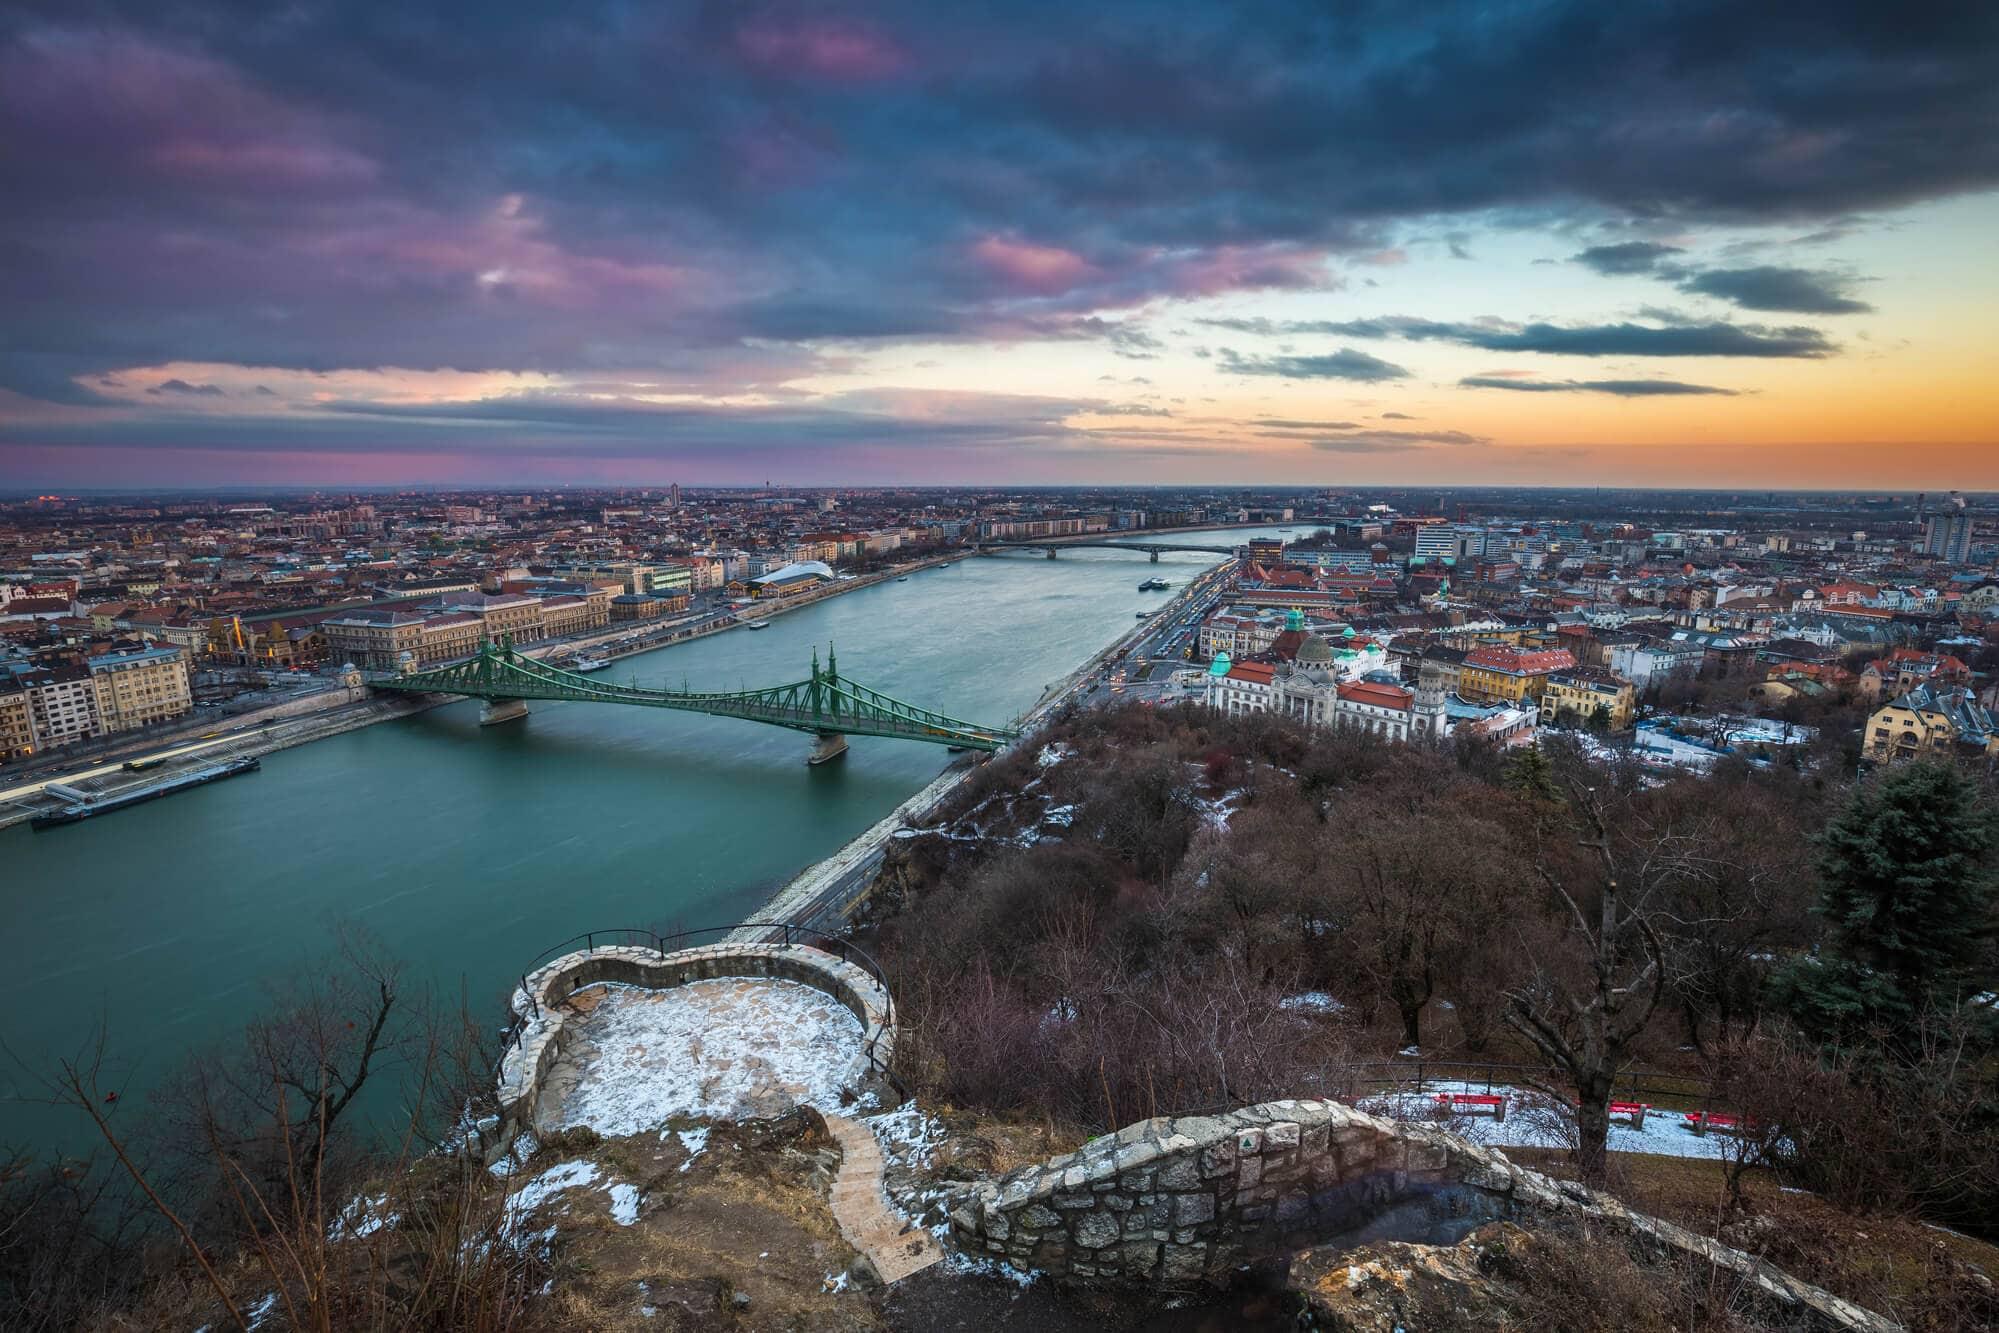 Budapest Instagram photo guide - Sunset view of Budapest seen from Gellért Hill Citadel